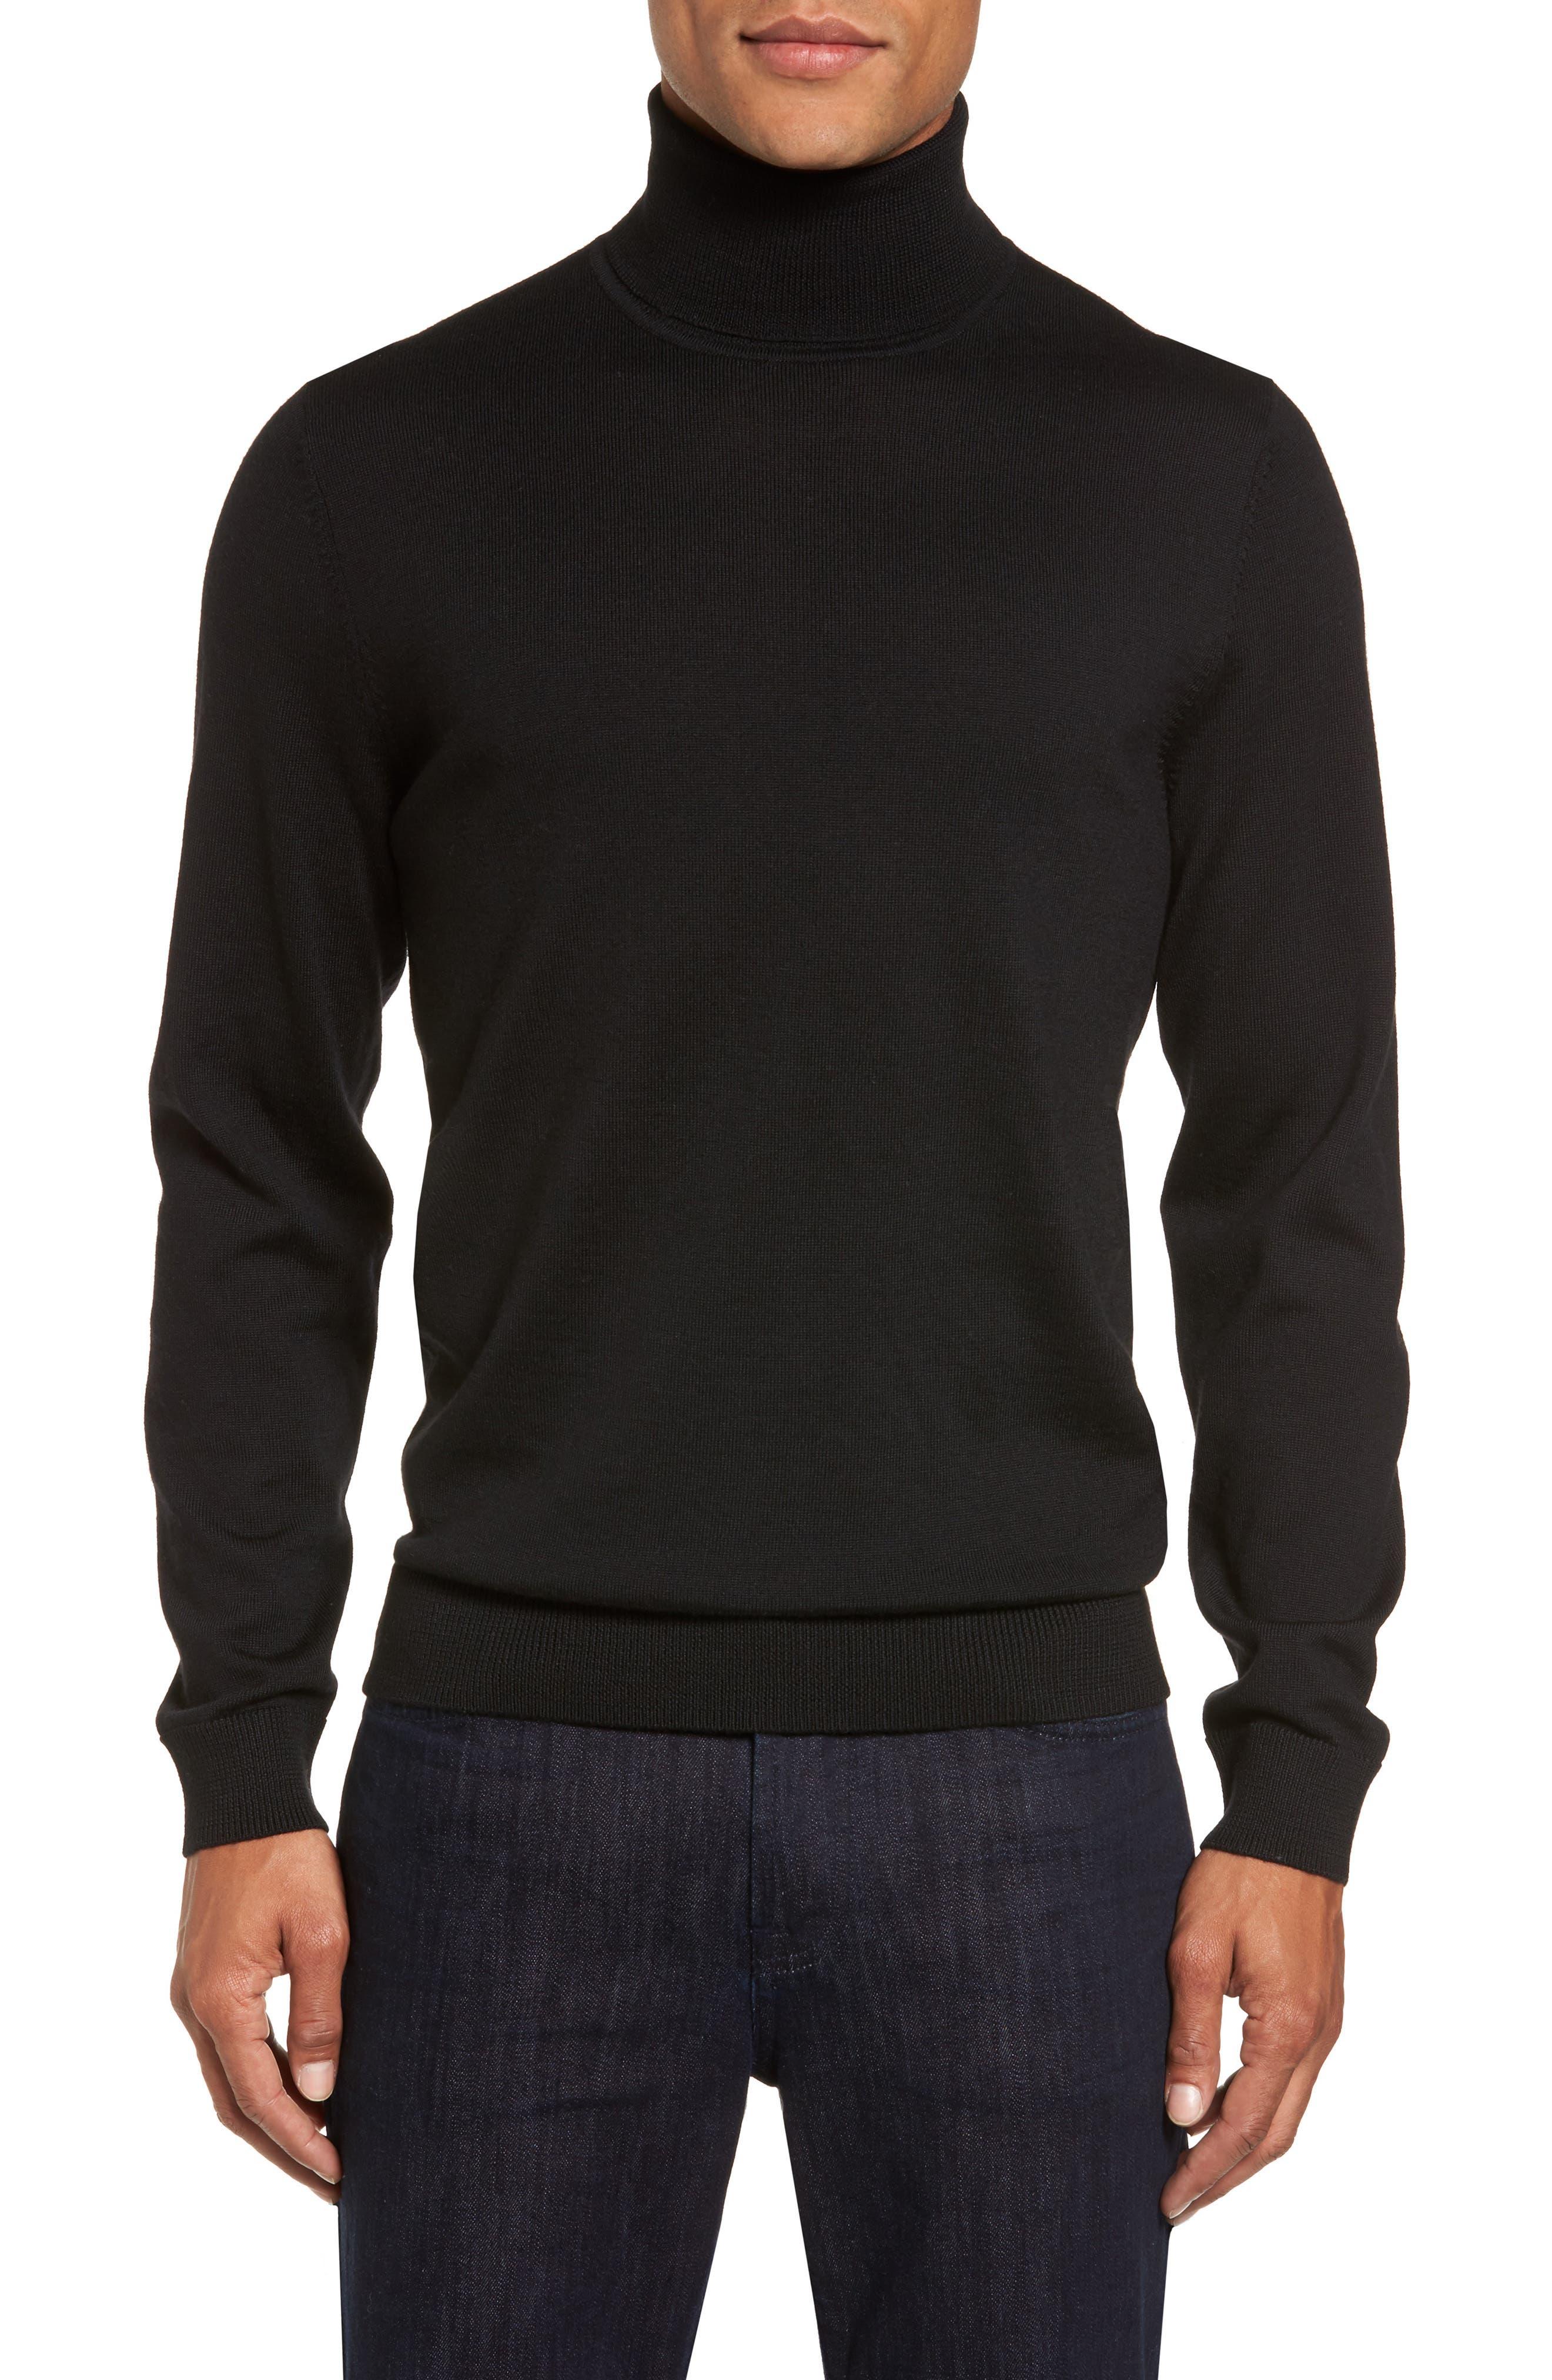 Merino Wool Turtleneck Sweater,                             Main thumbnail 1, color,                             BLACK CAVIAR